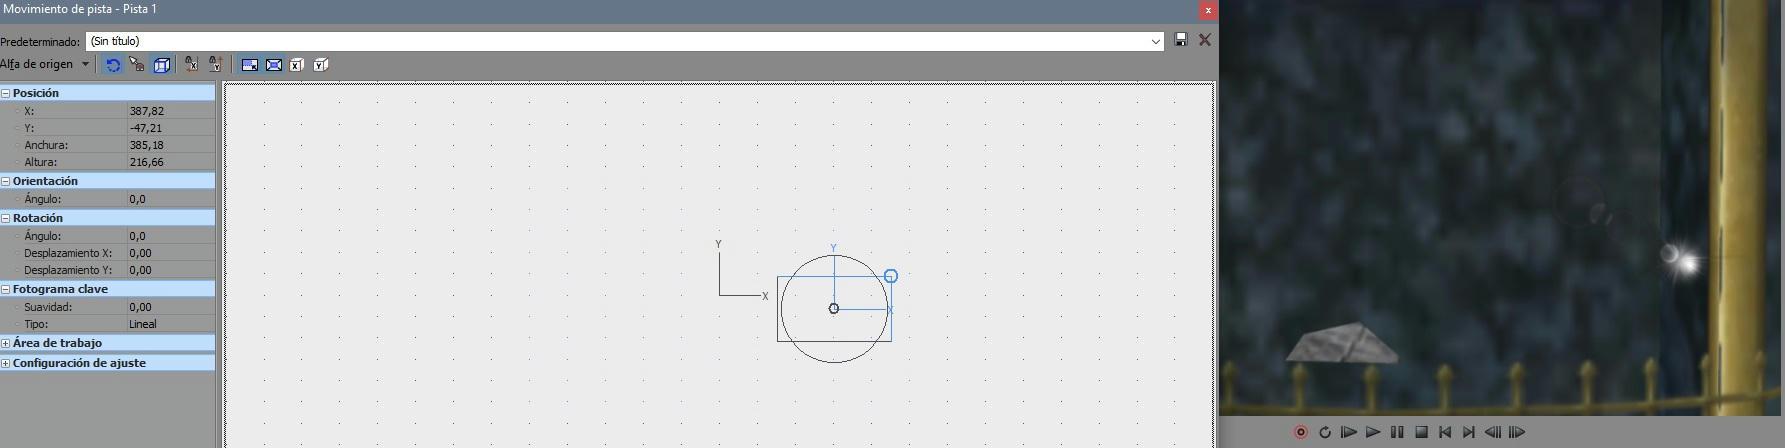 Tutorial Sony Vegas: Chroma key, uso eficaz y explicación P8hr9pxv5yickumzg